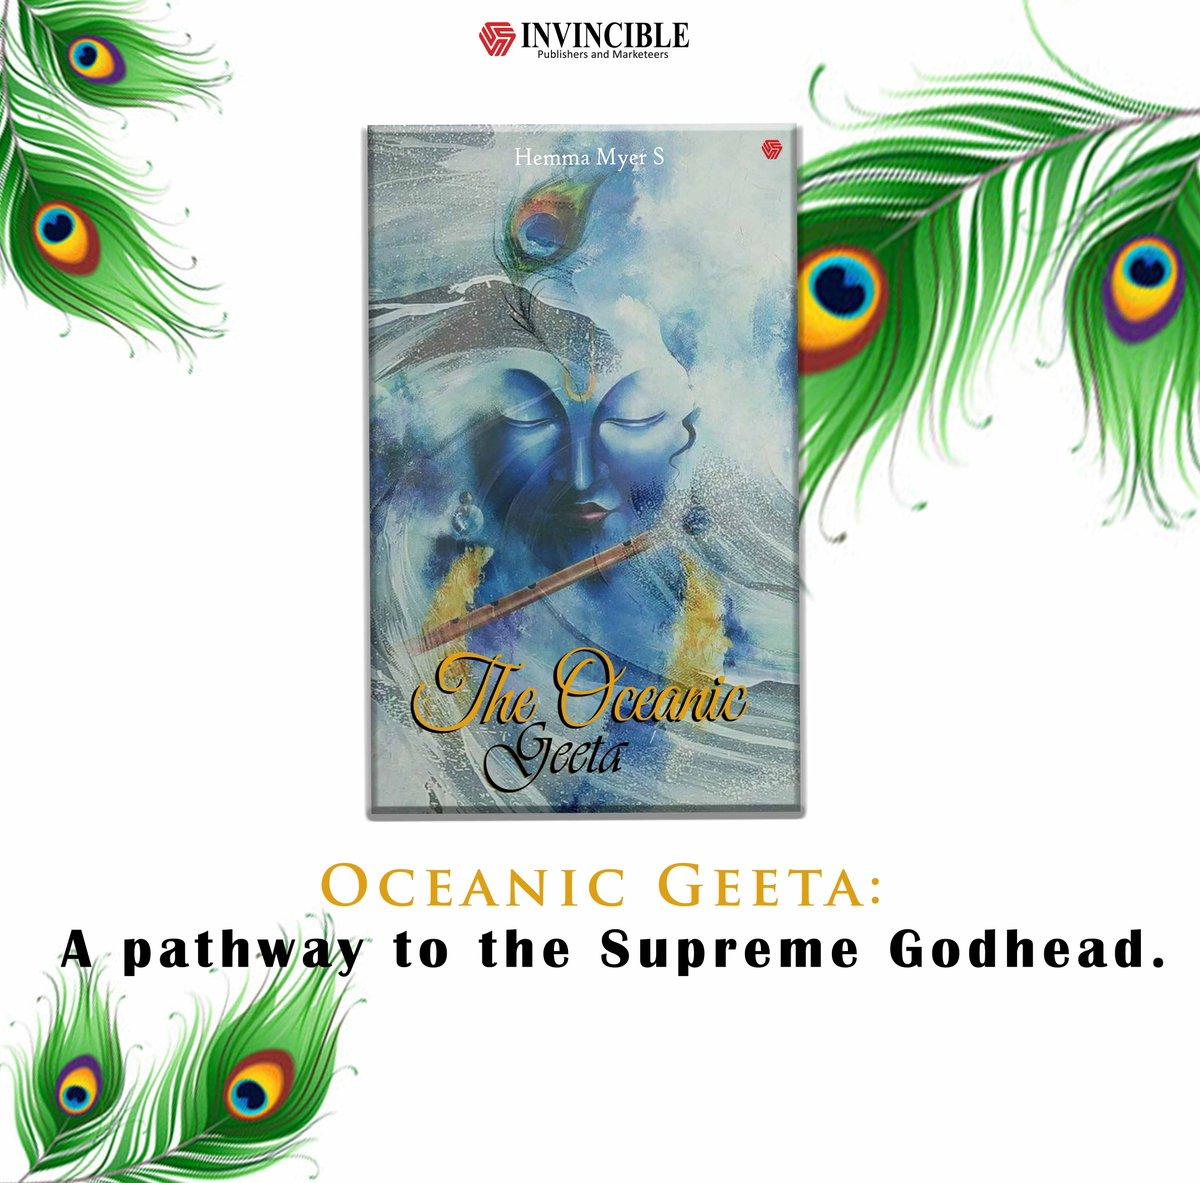 #BhagavadGeeta #Geeta #Ocean #TheOceanicGeeta #EsotericWisdom #Spiritual #Book #Wisdom #Wise #SpiritualGrowth #SpiritualJourney #BeInvincible #Amazon #Book #HemaSood #LordKrishna #Life #MeaningOfLife #World #Readers #Writers Hema Myer Sood https://t.co/QE1x4QCkRz https://t.co/kRznLwPioi